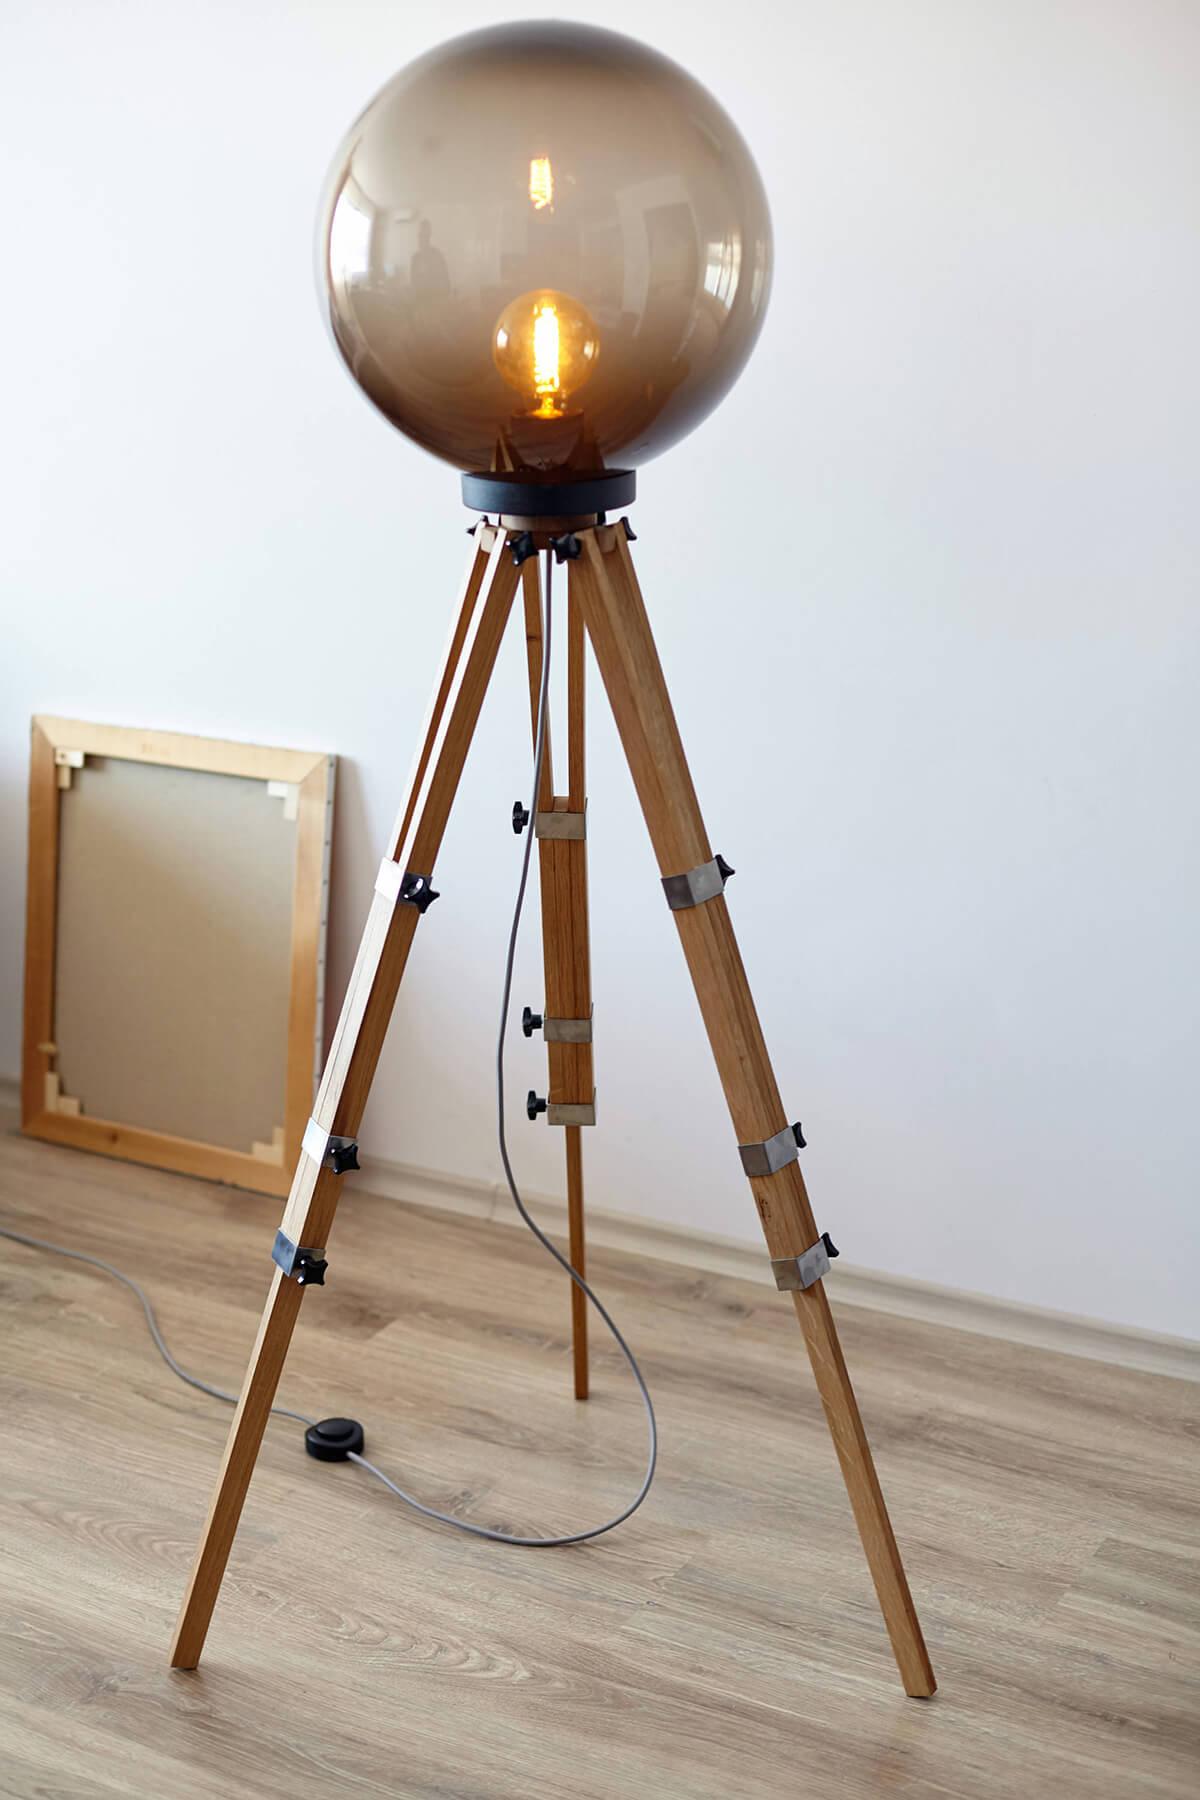 Awesome Tripod Lamp with Large Glass Globe